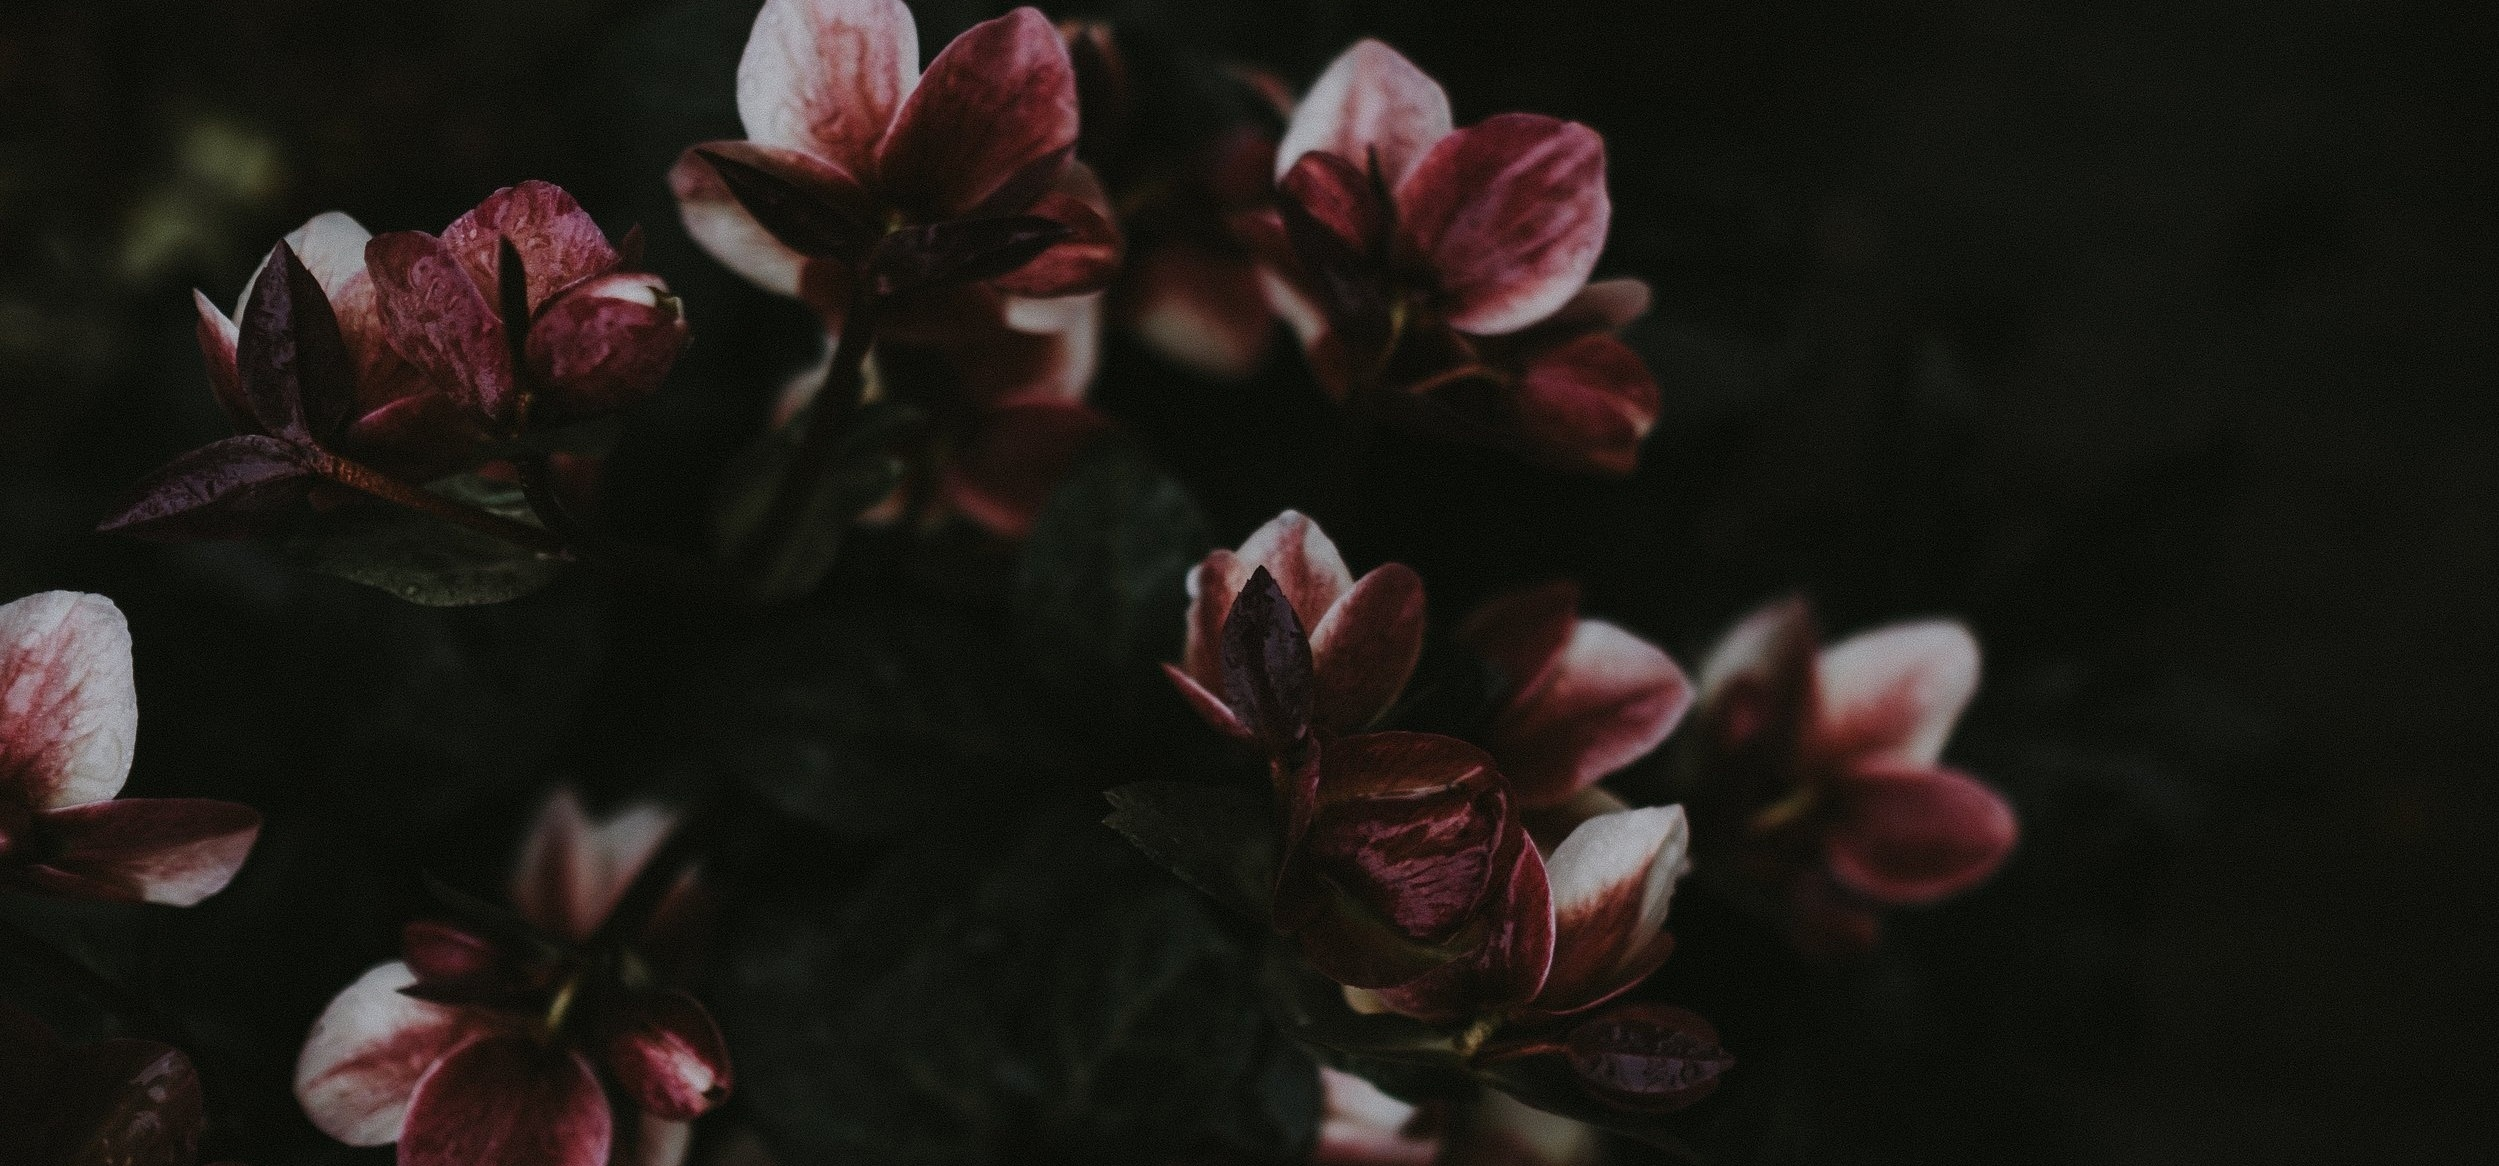 Pressing & Preserving Memories into Custom Bouquet Art. -